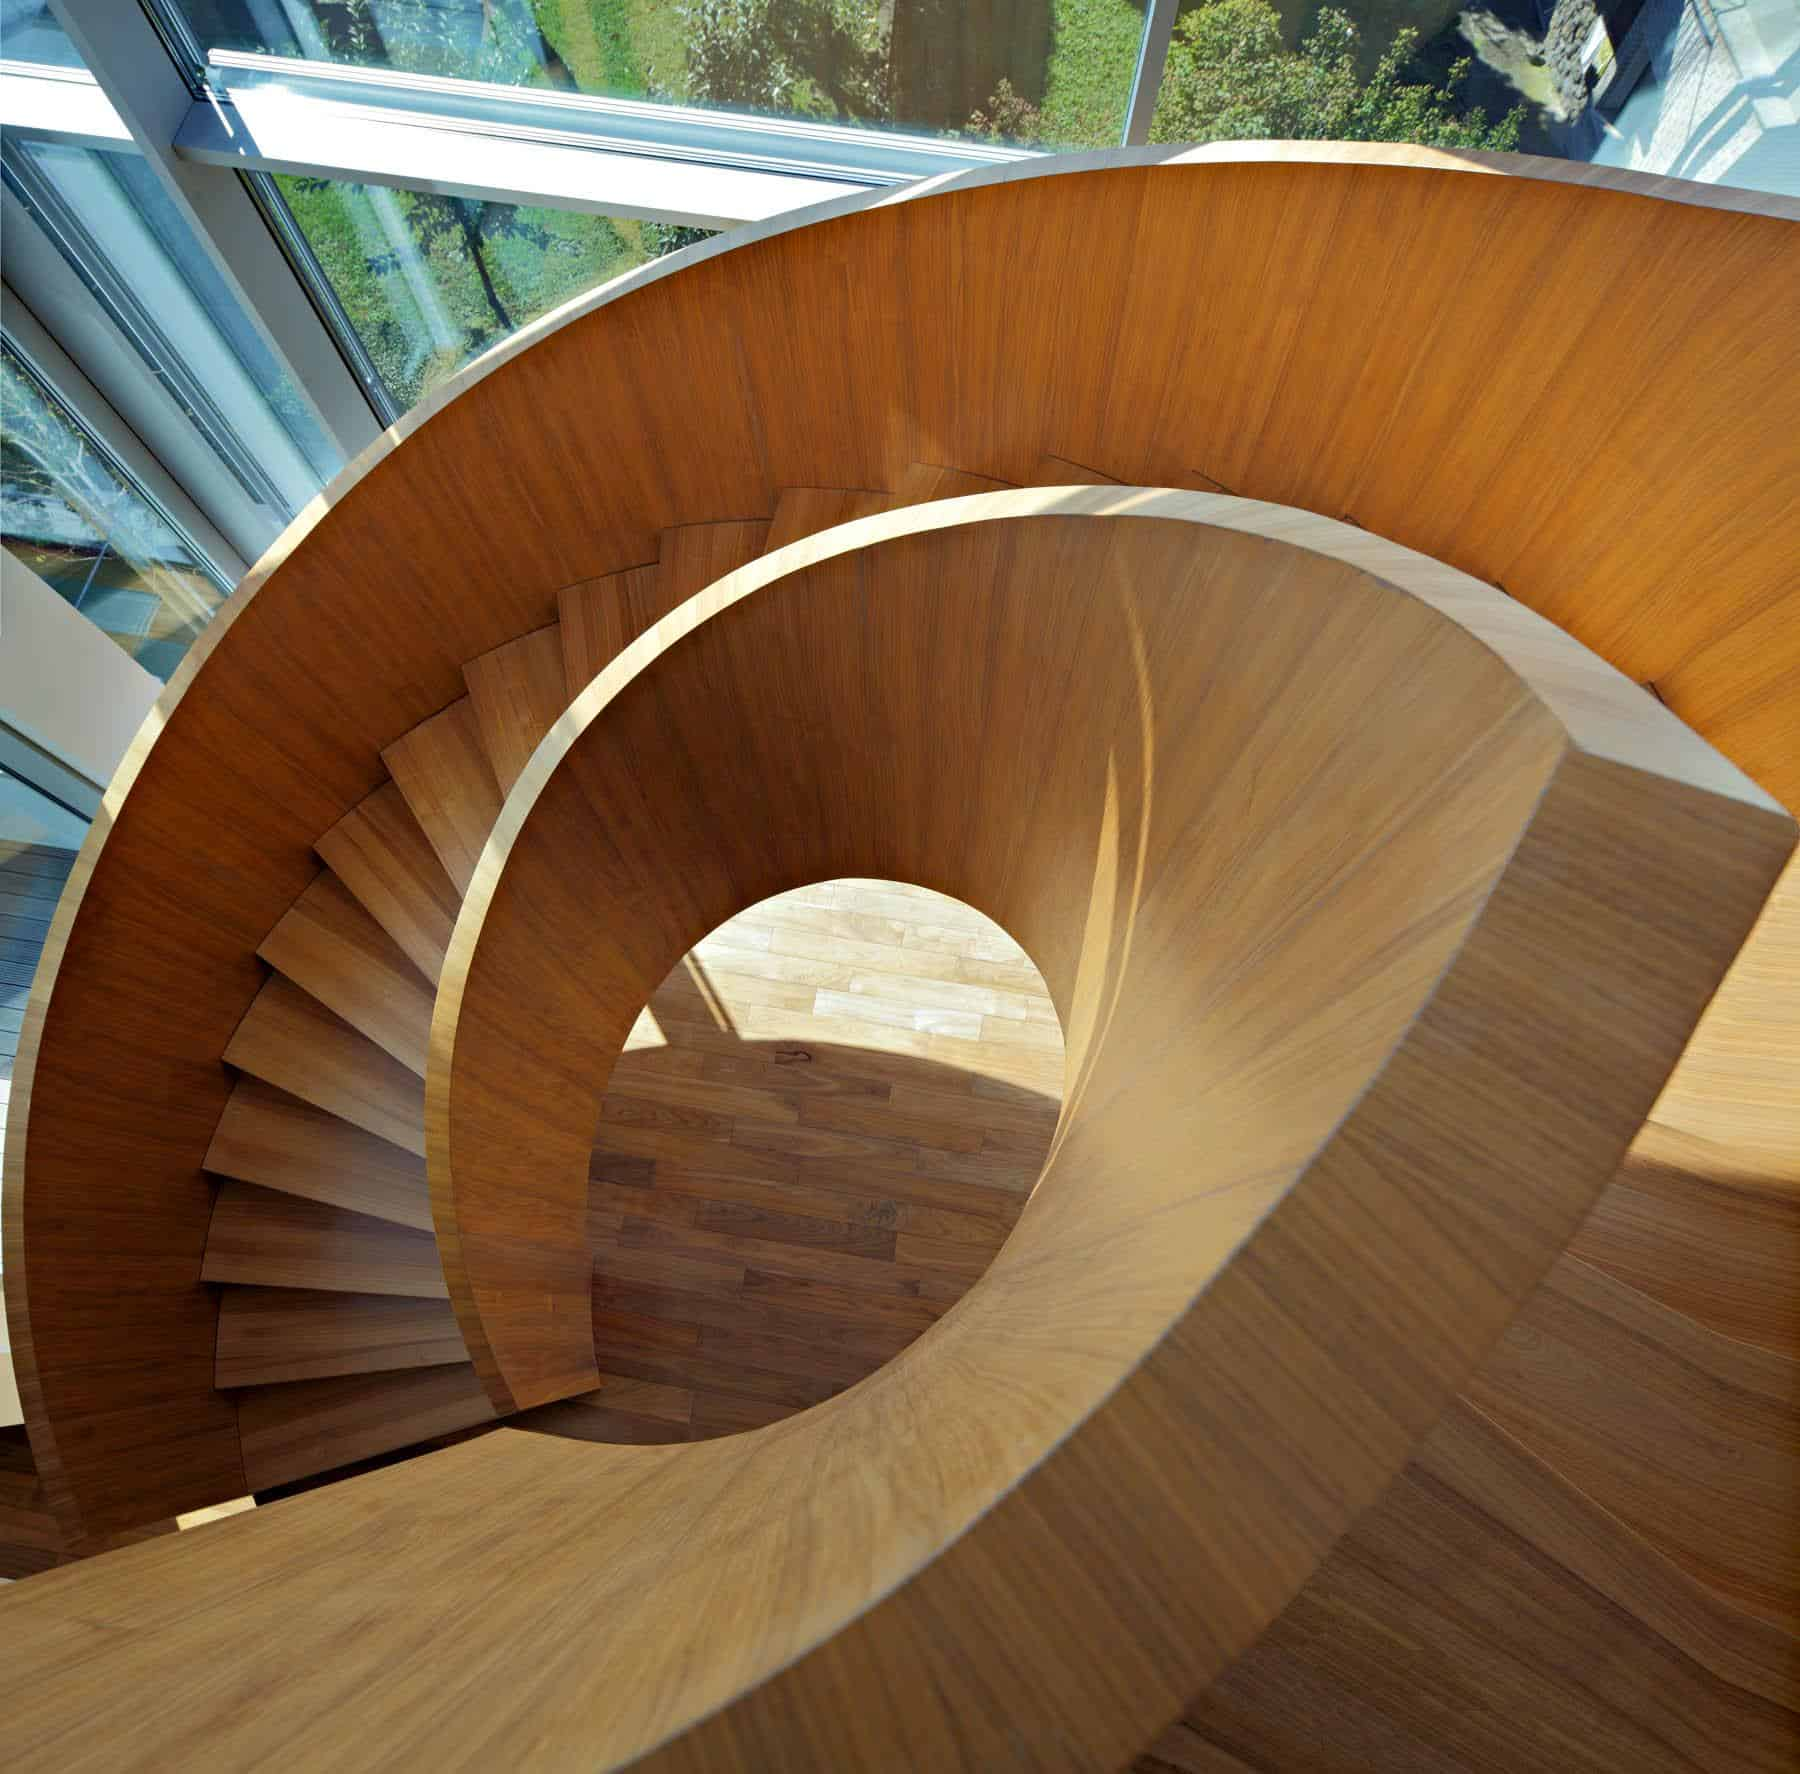 Concrete Circular Stairwell Focus of Minimalist Residence